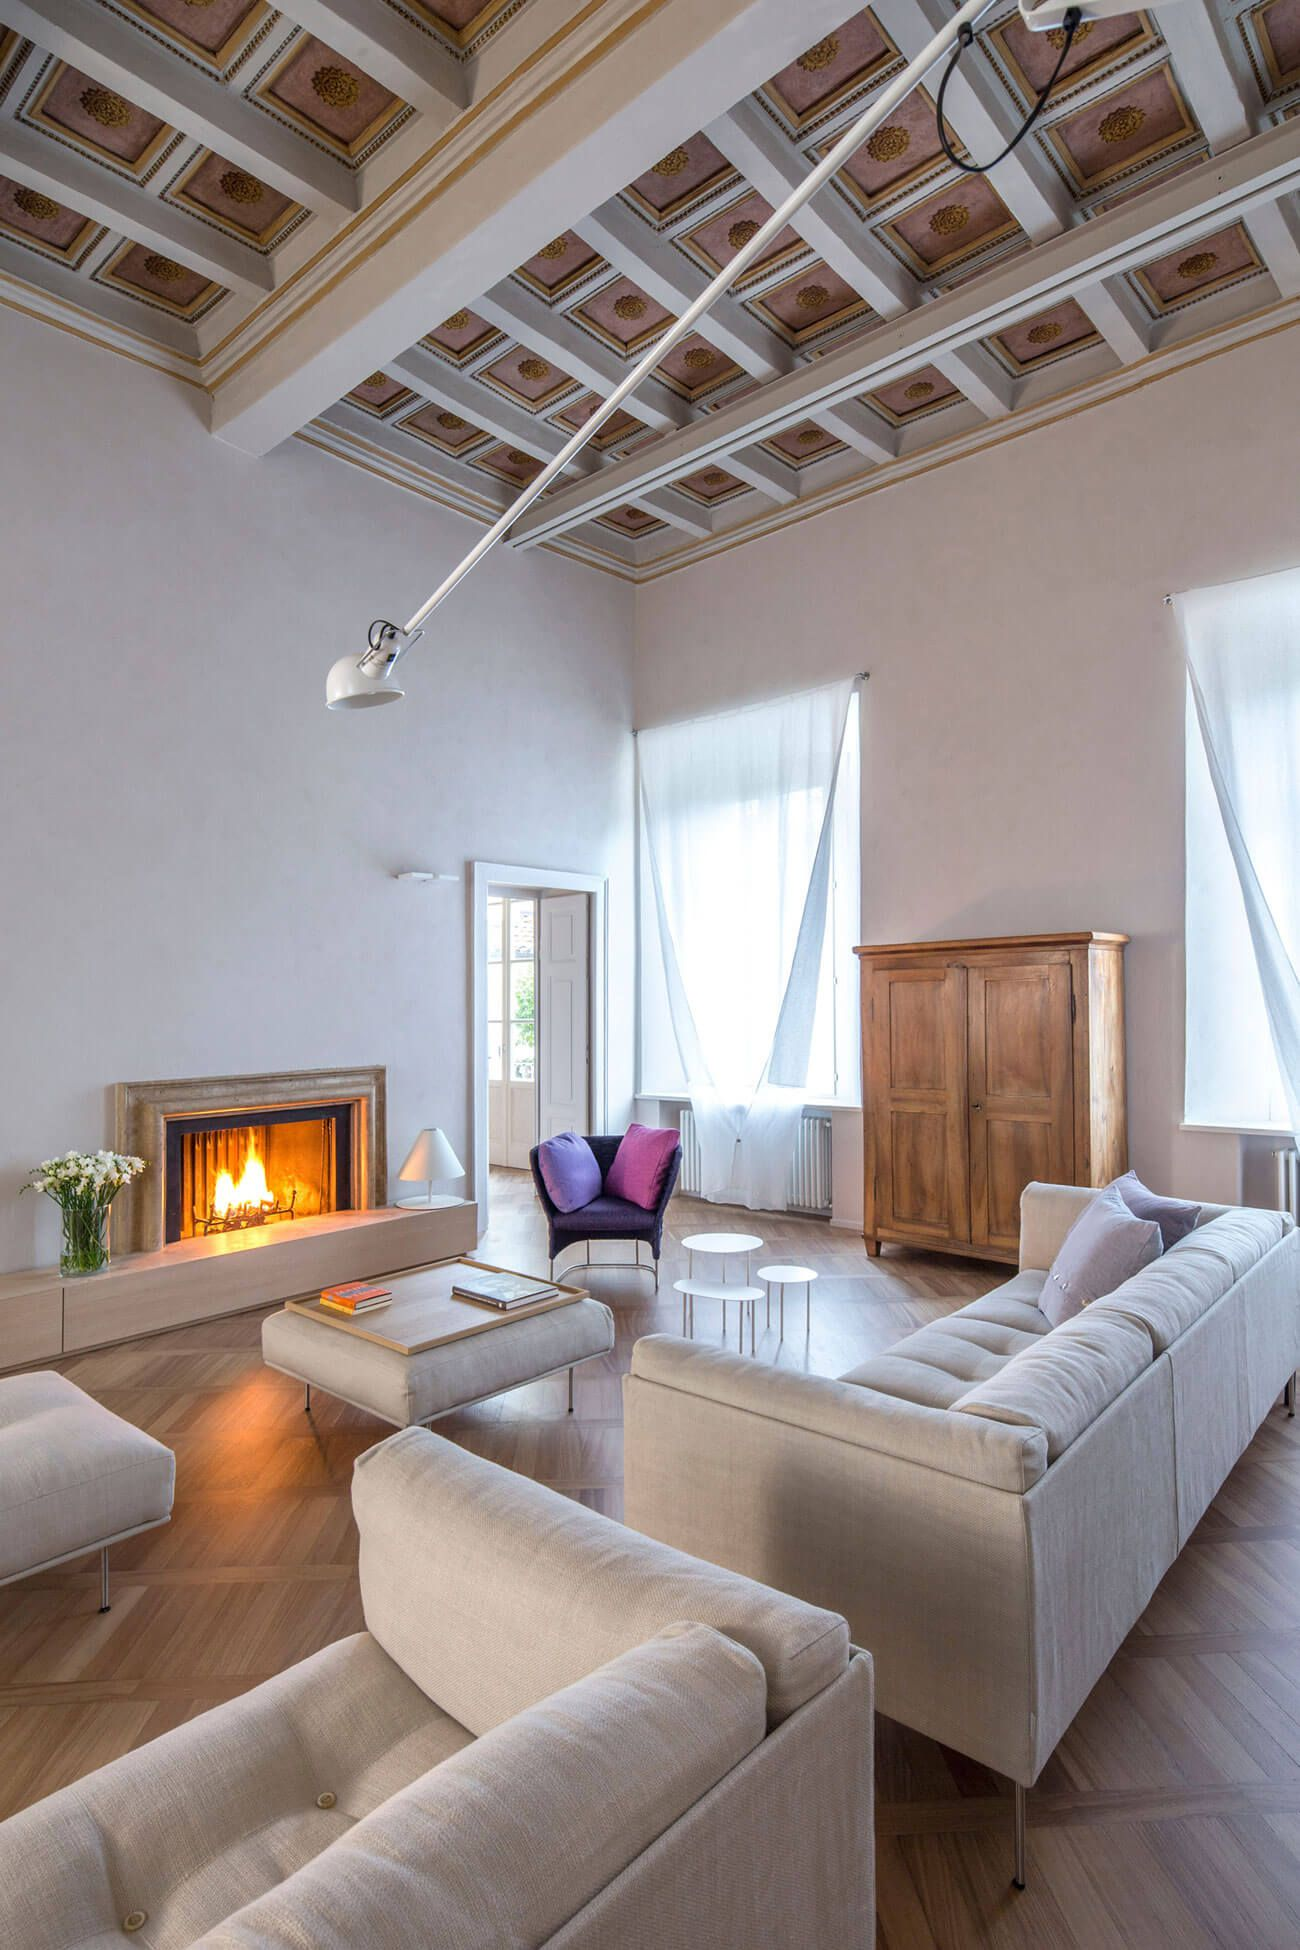 apartment-piacenza-studio-blesi-subitoni-03